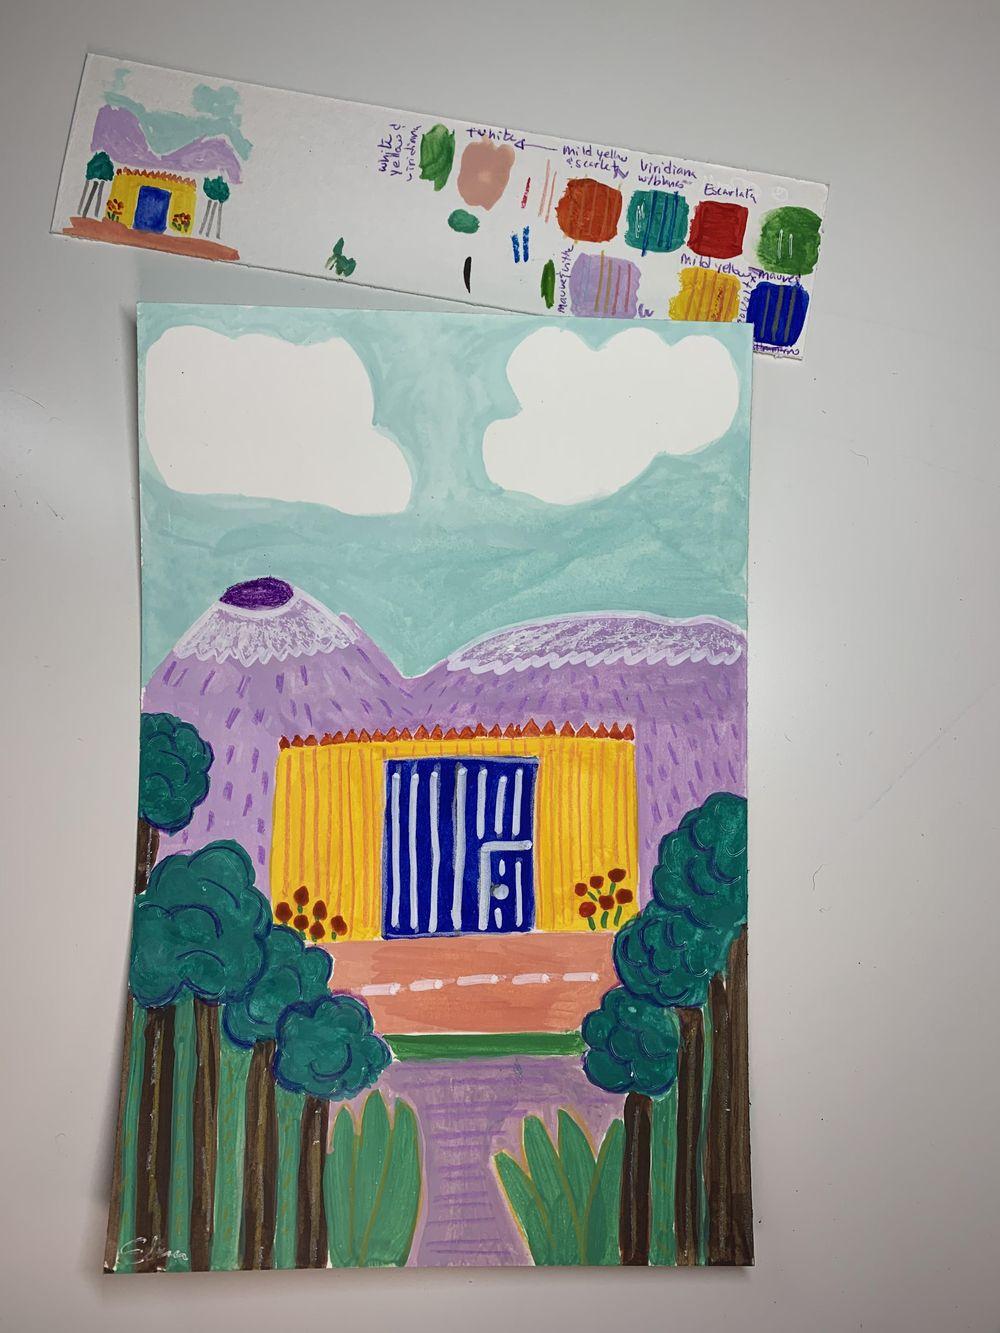 Casa de Puebla - image 3 - student project